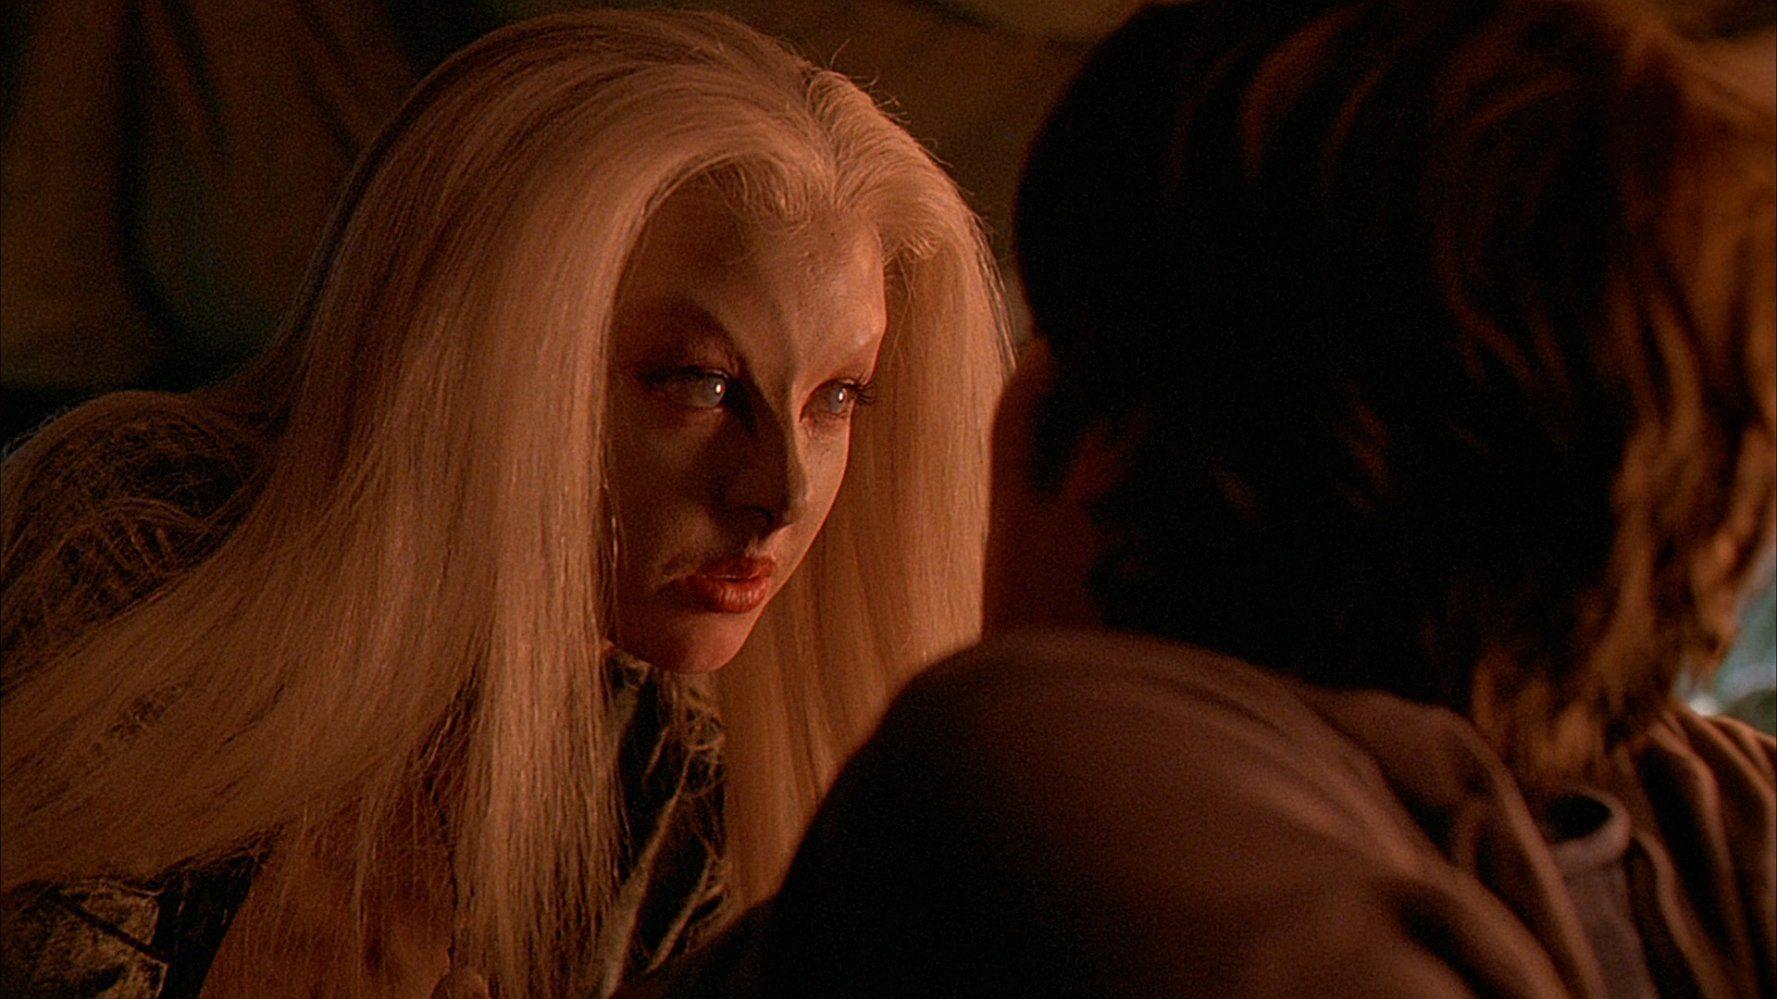 Katherine Isabelle in Ginger Snaps